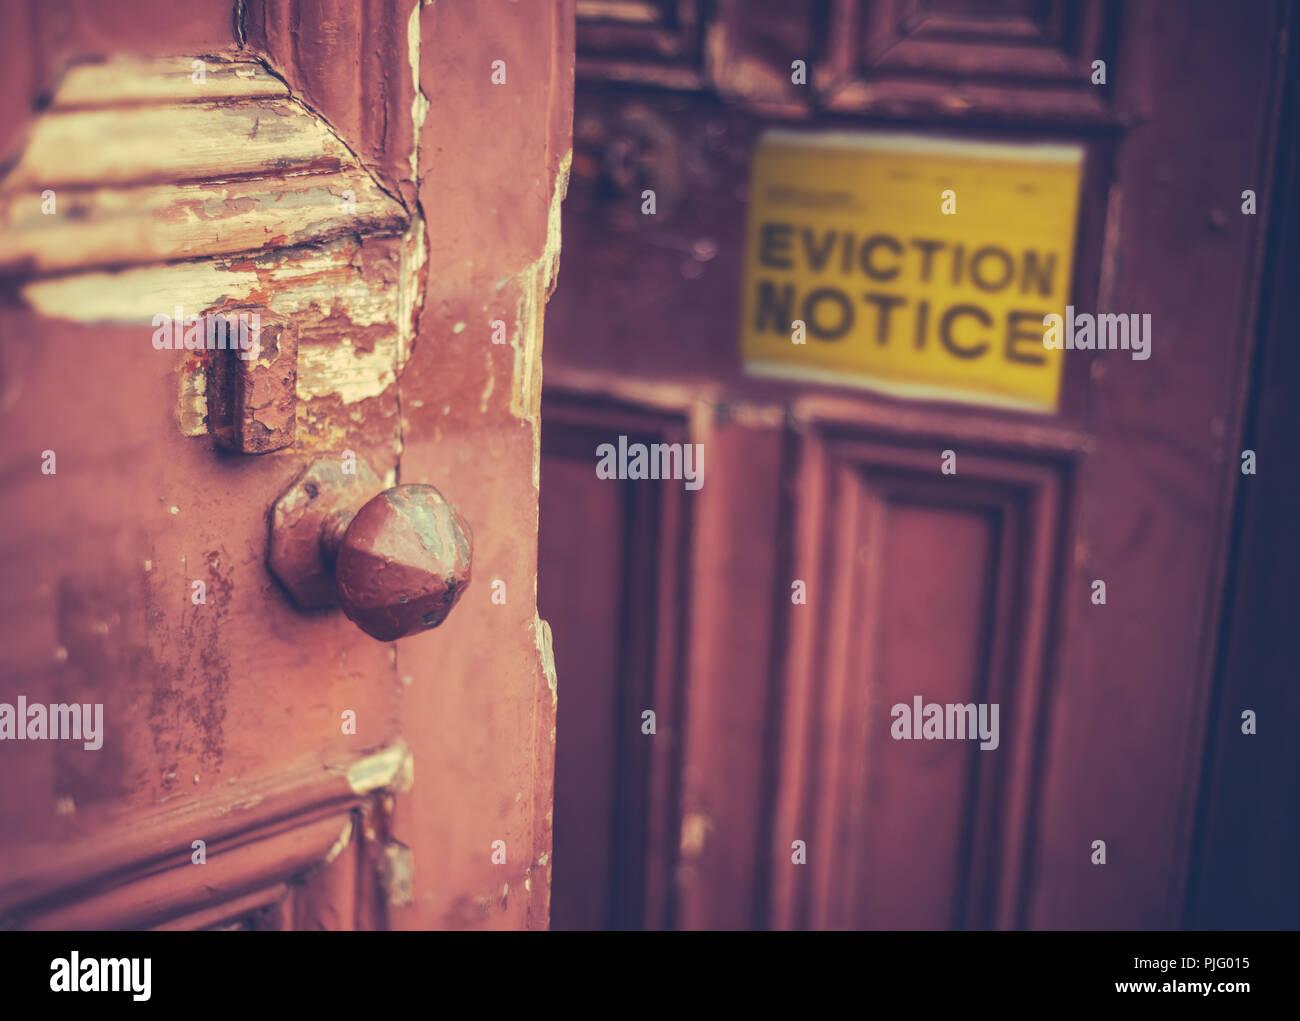 Sucio Antigua puerta con un aviso de desalojo amarillo Imagen De Stock